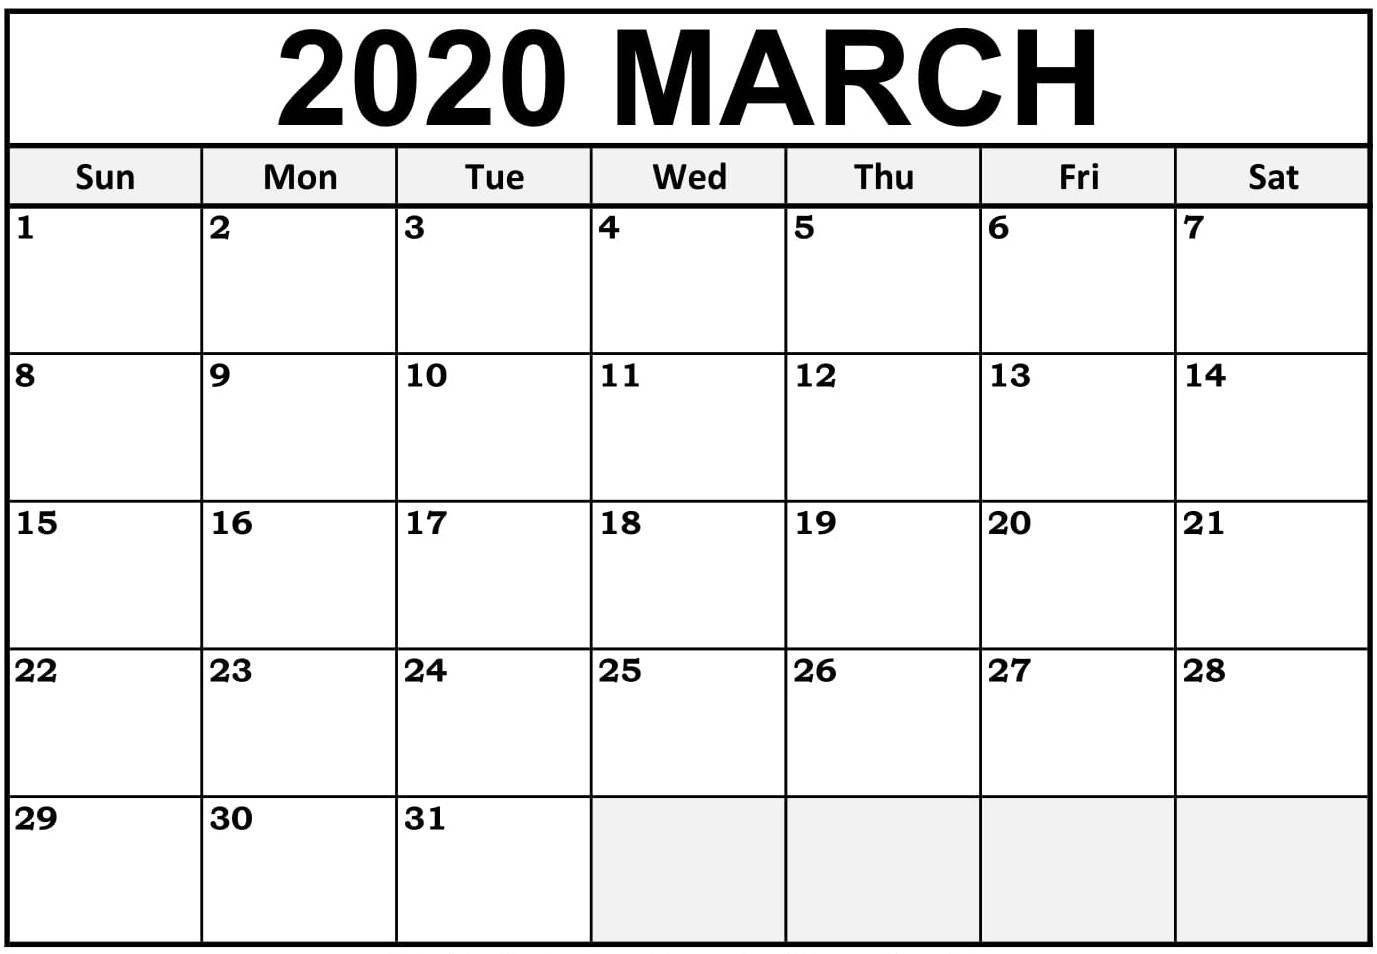 Printable March 2020 Calendar Uk Flag With Holidays - Set-2020 Uk Monthly Calendar Uk